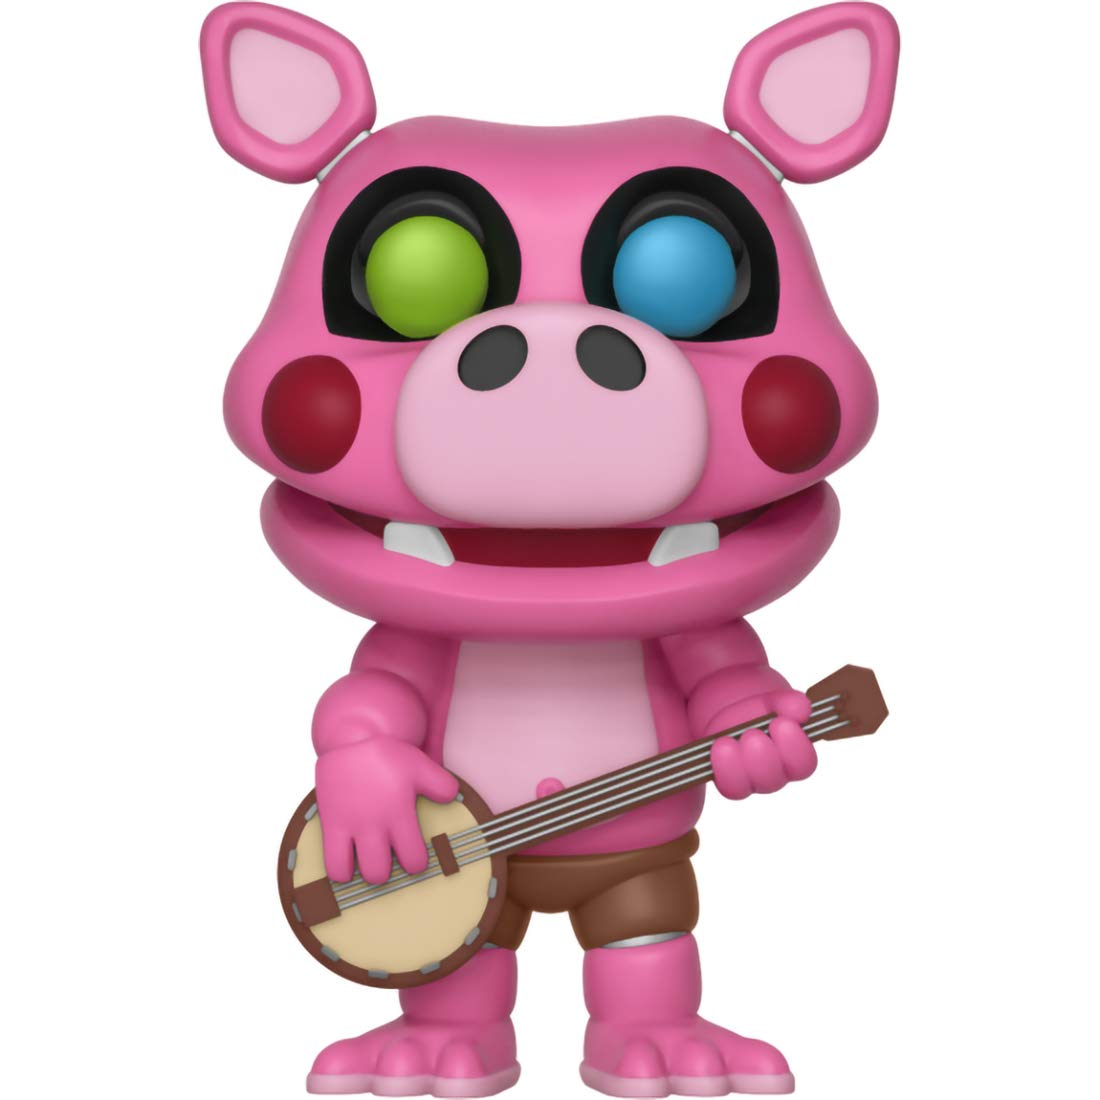 #364 // 32056 - B Games Vinyl Figure /& 1 POP Compatible PET Plastic Graphical Protector Bundle Pig Patch: Five Nights at Freddys x Funko POP